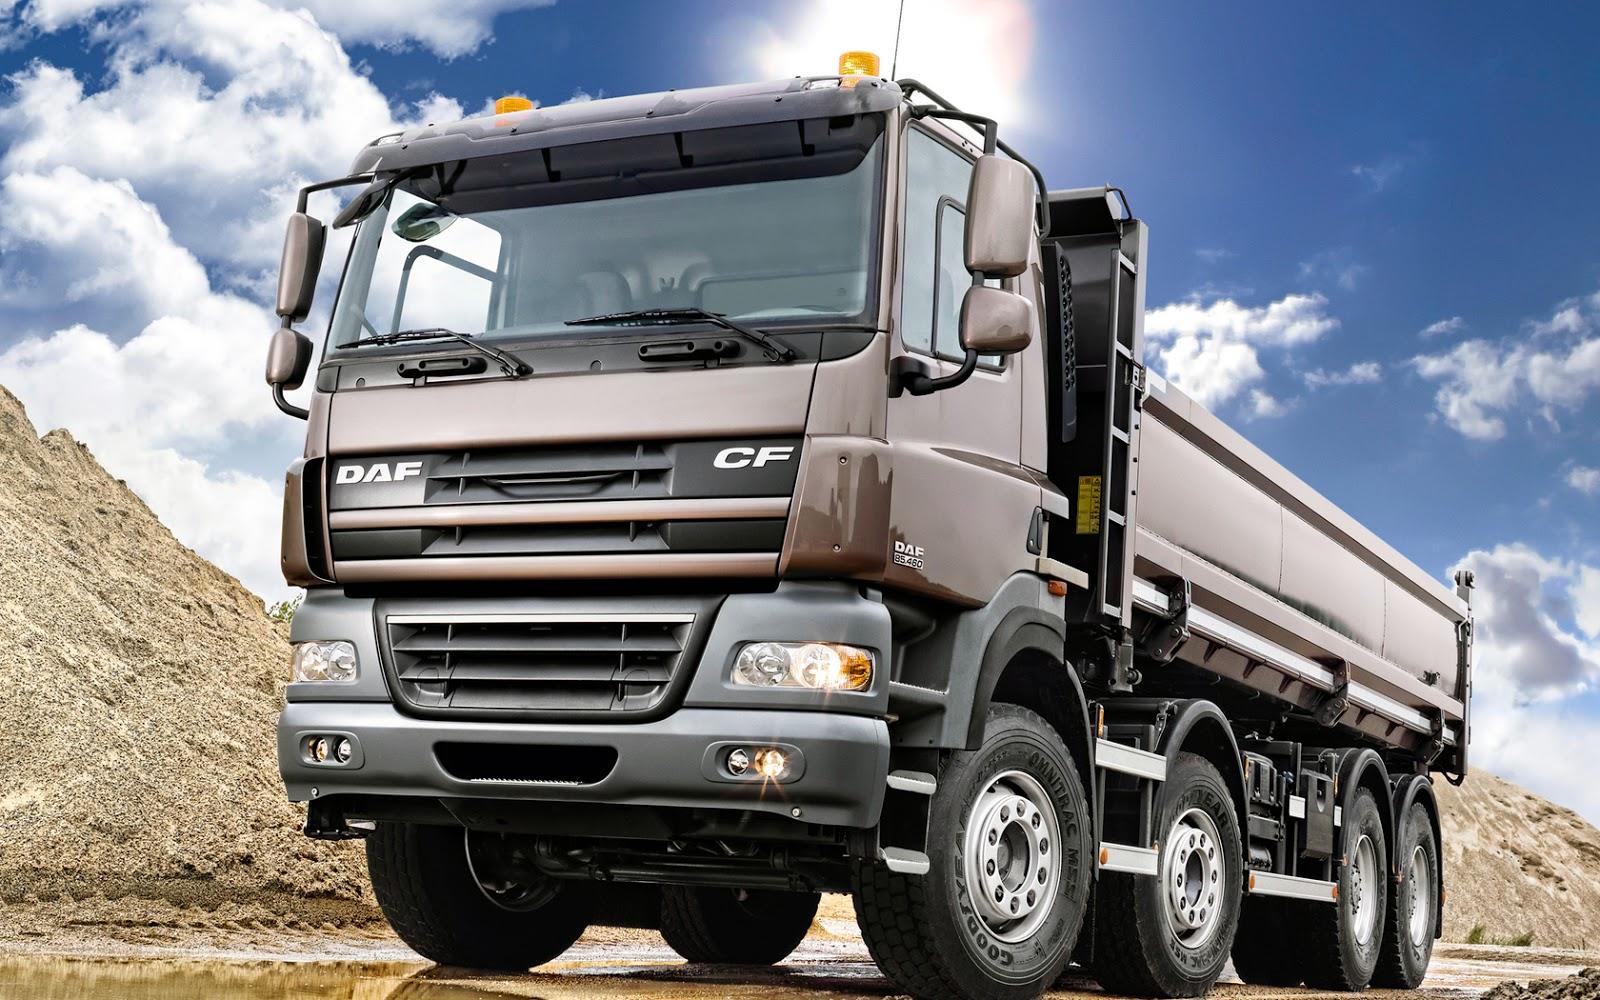 Ifa Truck Pics Hd: HD Car Wallpapers: Dump Truck Wallpapers